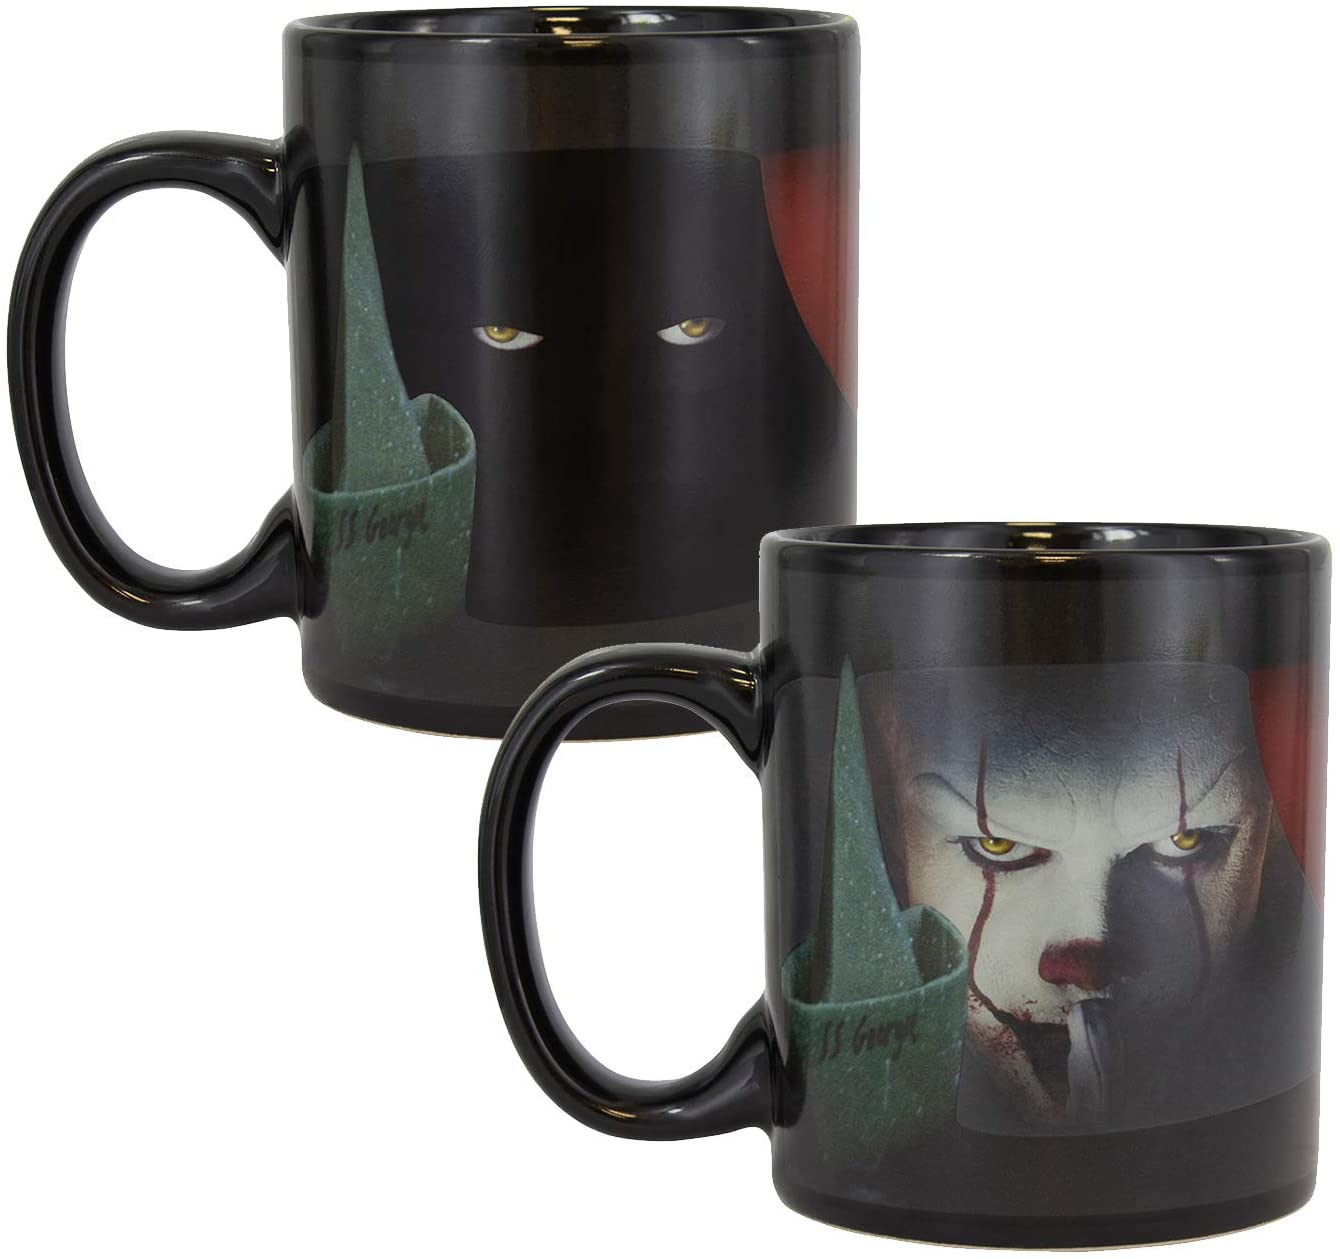 Paladone Pennywise Heat Change Mug - IT Horror Movie Drinkware